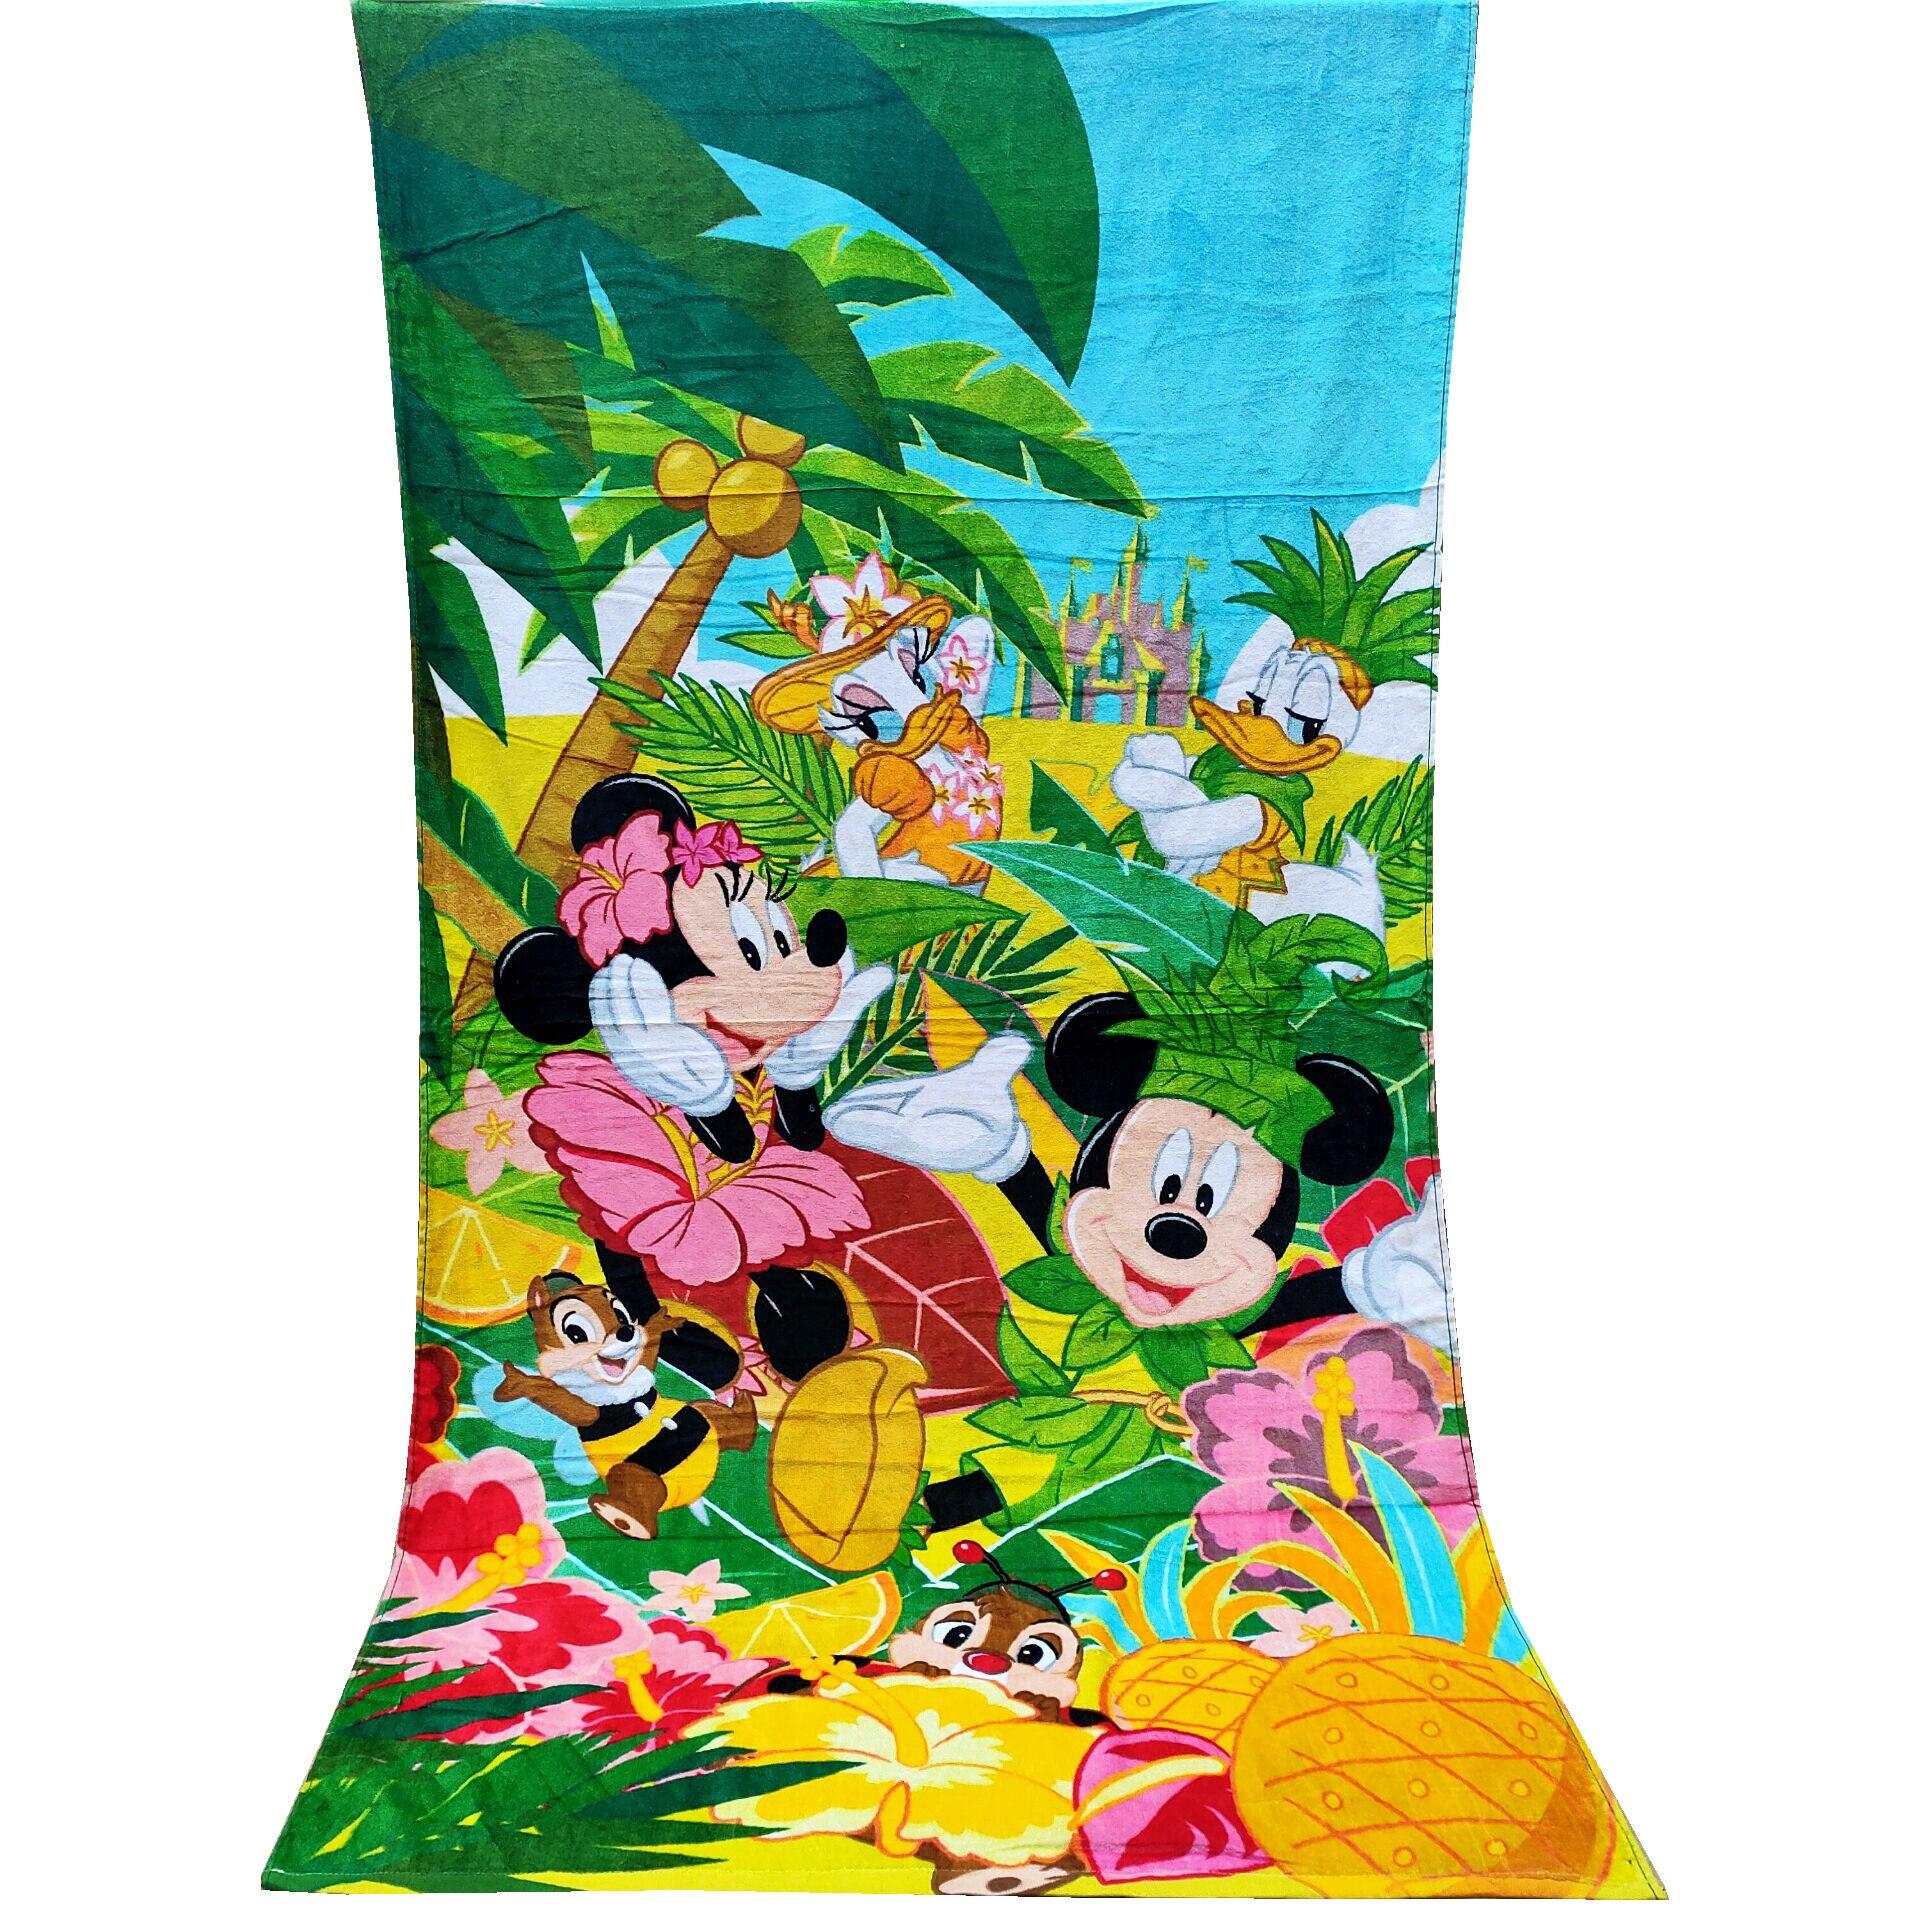 Minnie de Disney de baño de Mickey Mouse, toalla de algodón de 100% para niños, toalla de playa de verano, toalla de ducha, toalla de jardín de infancia